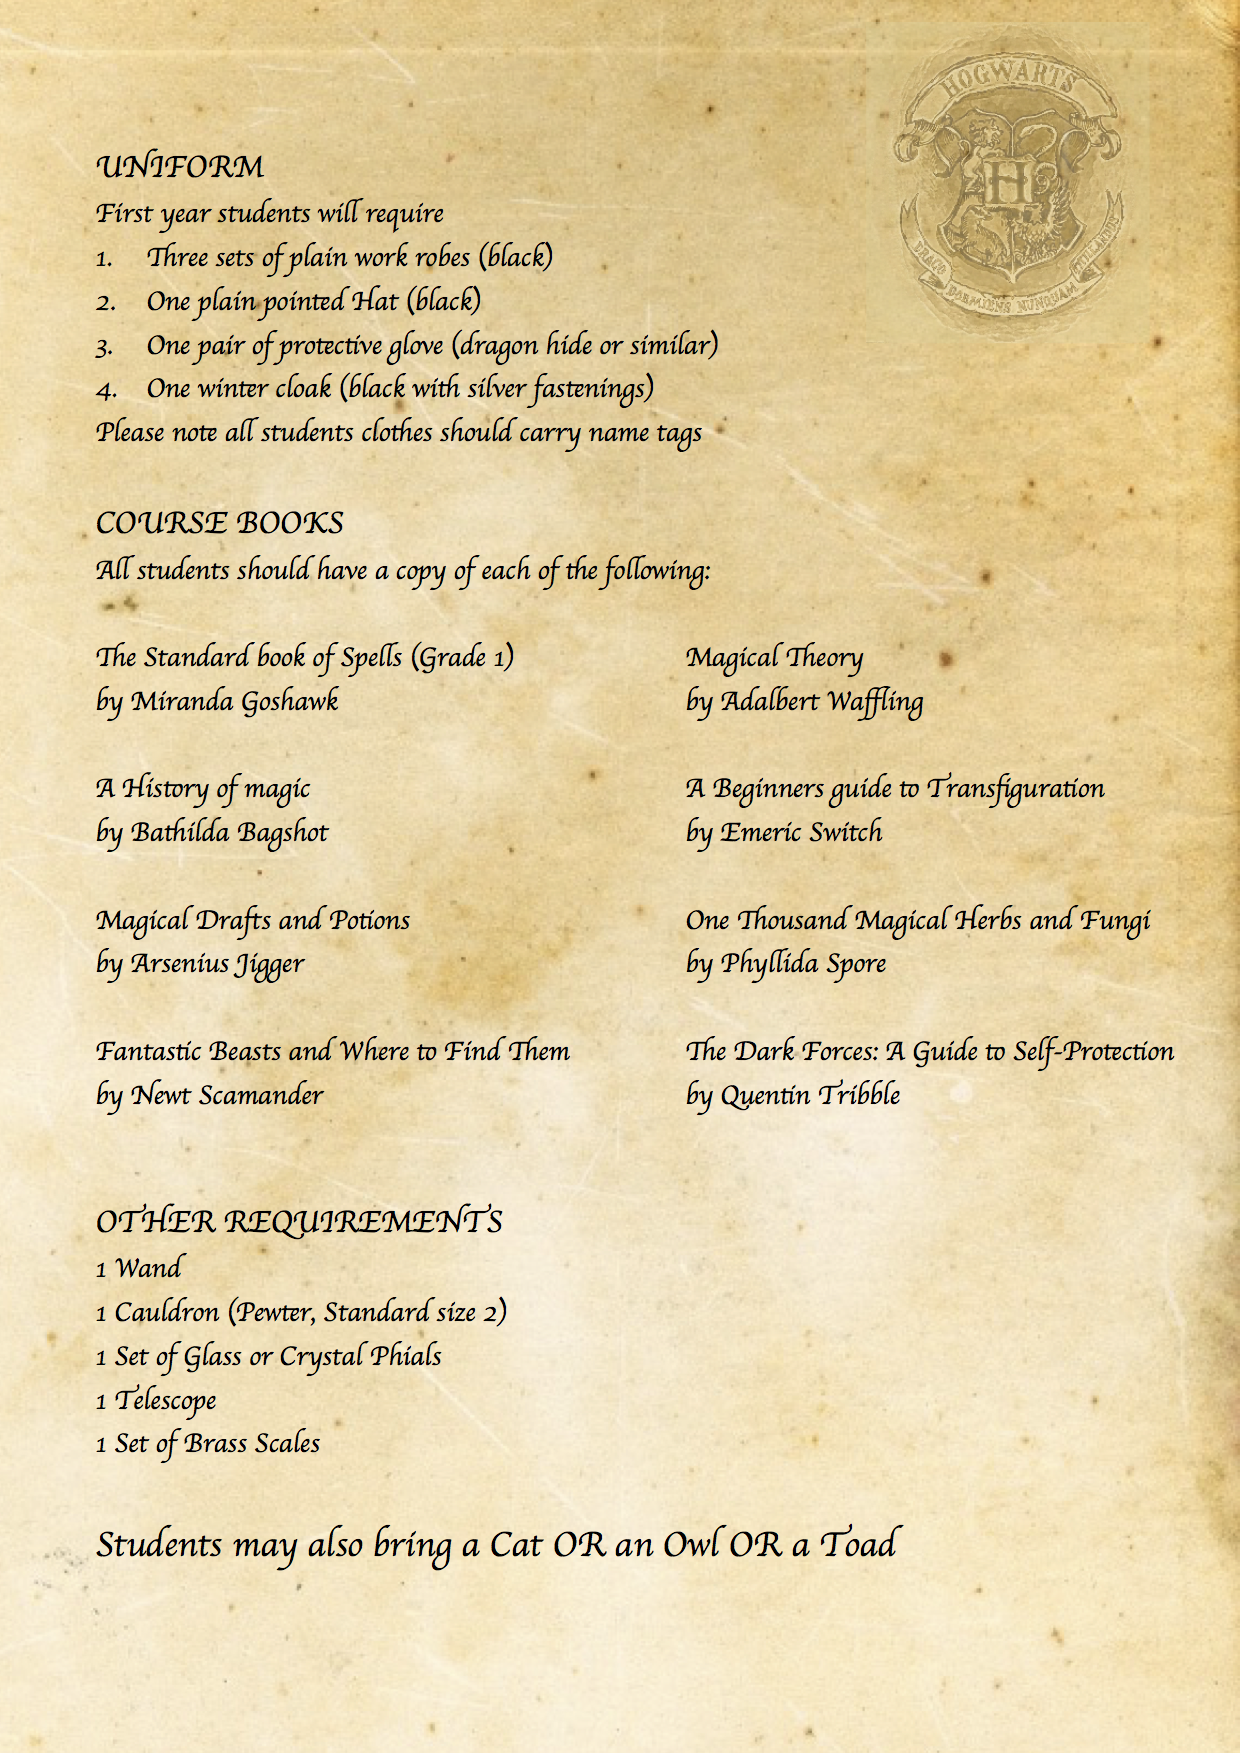 Harry Potter DIY Hogwarts acceptance letter requirement